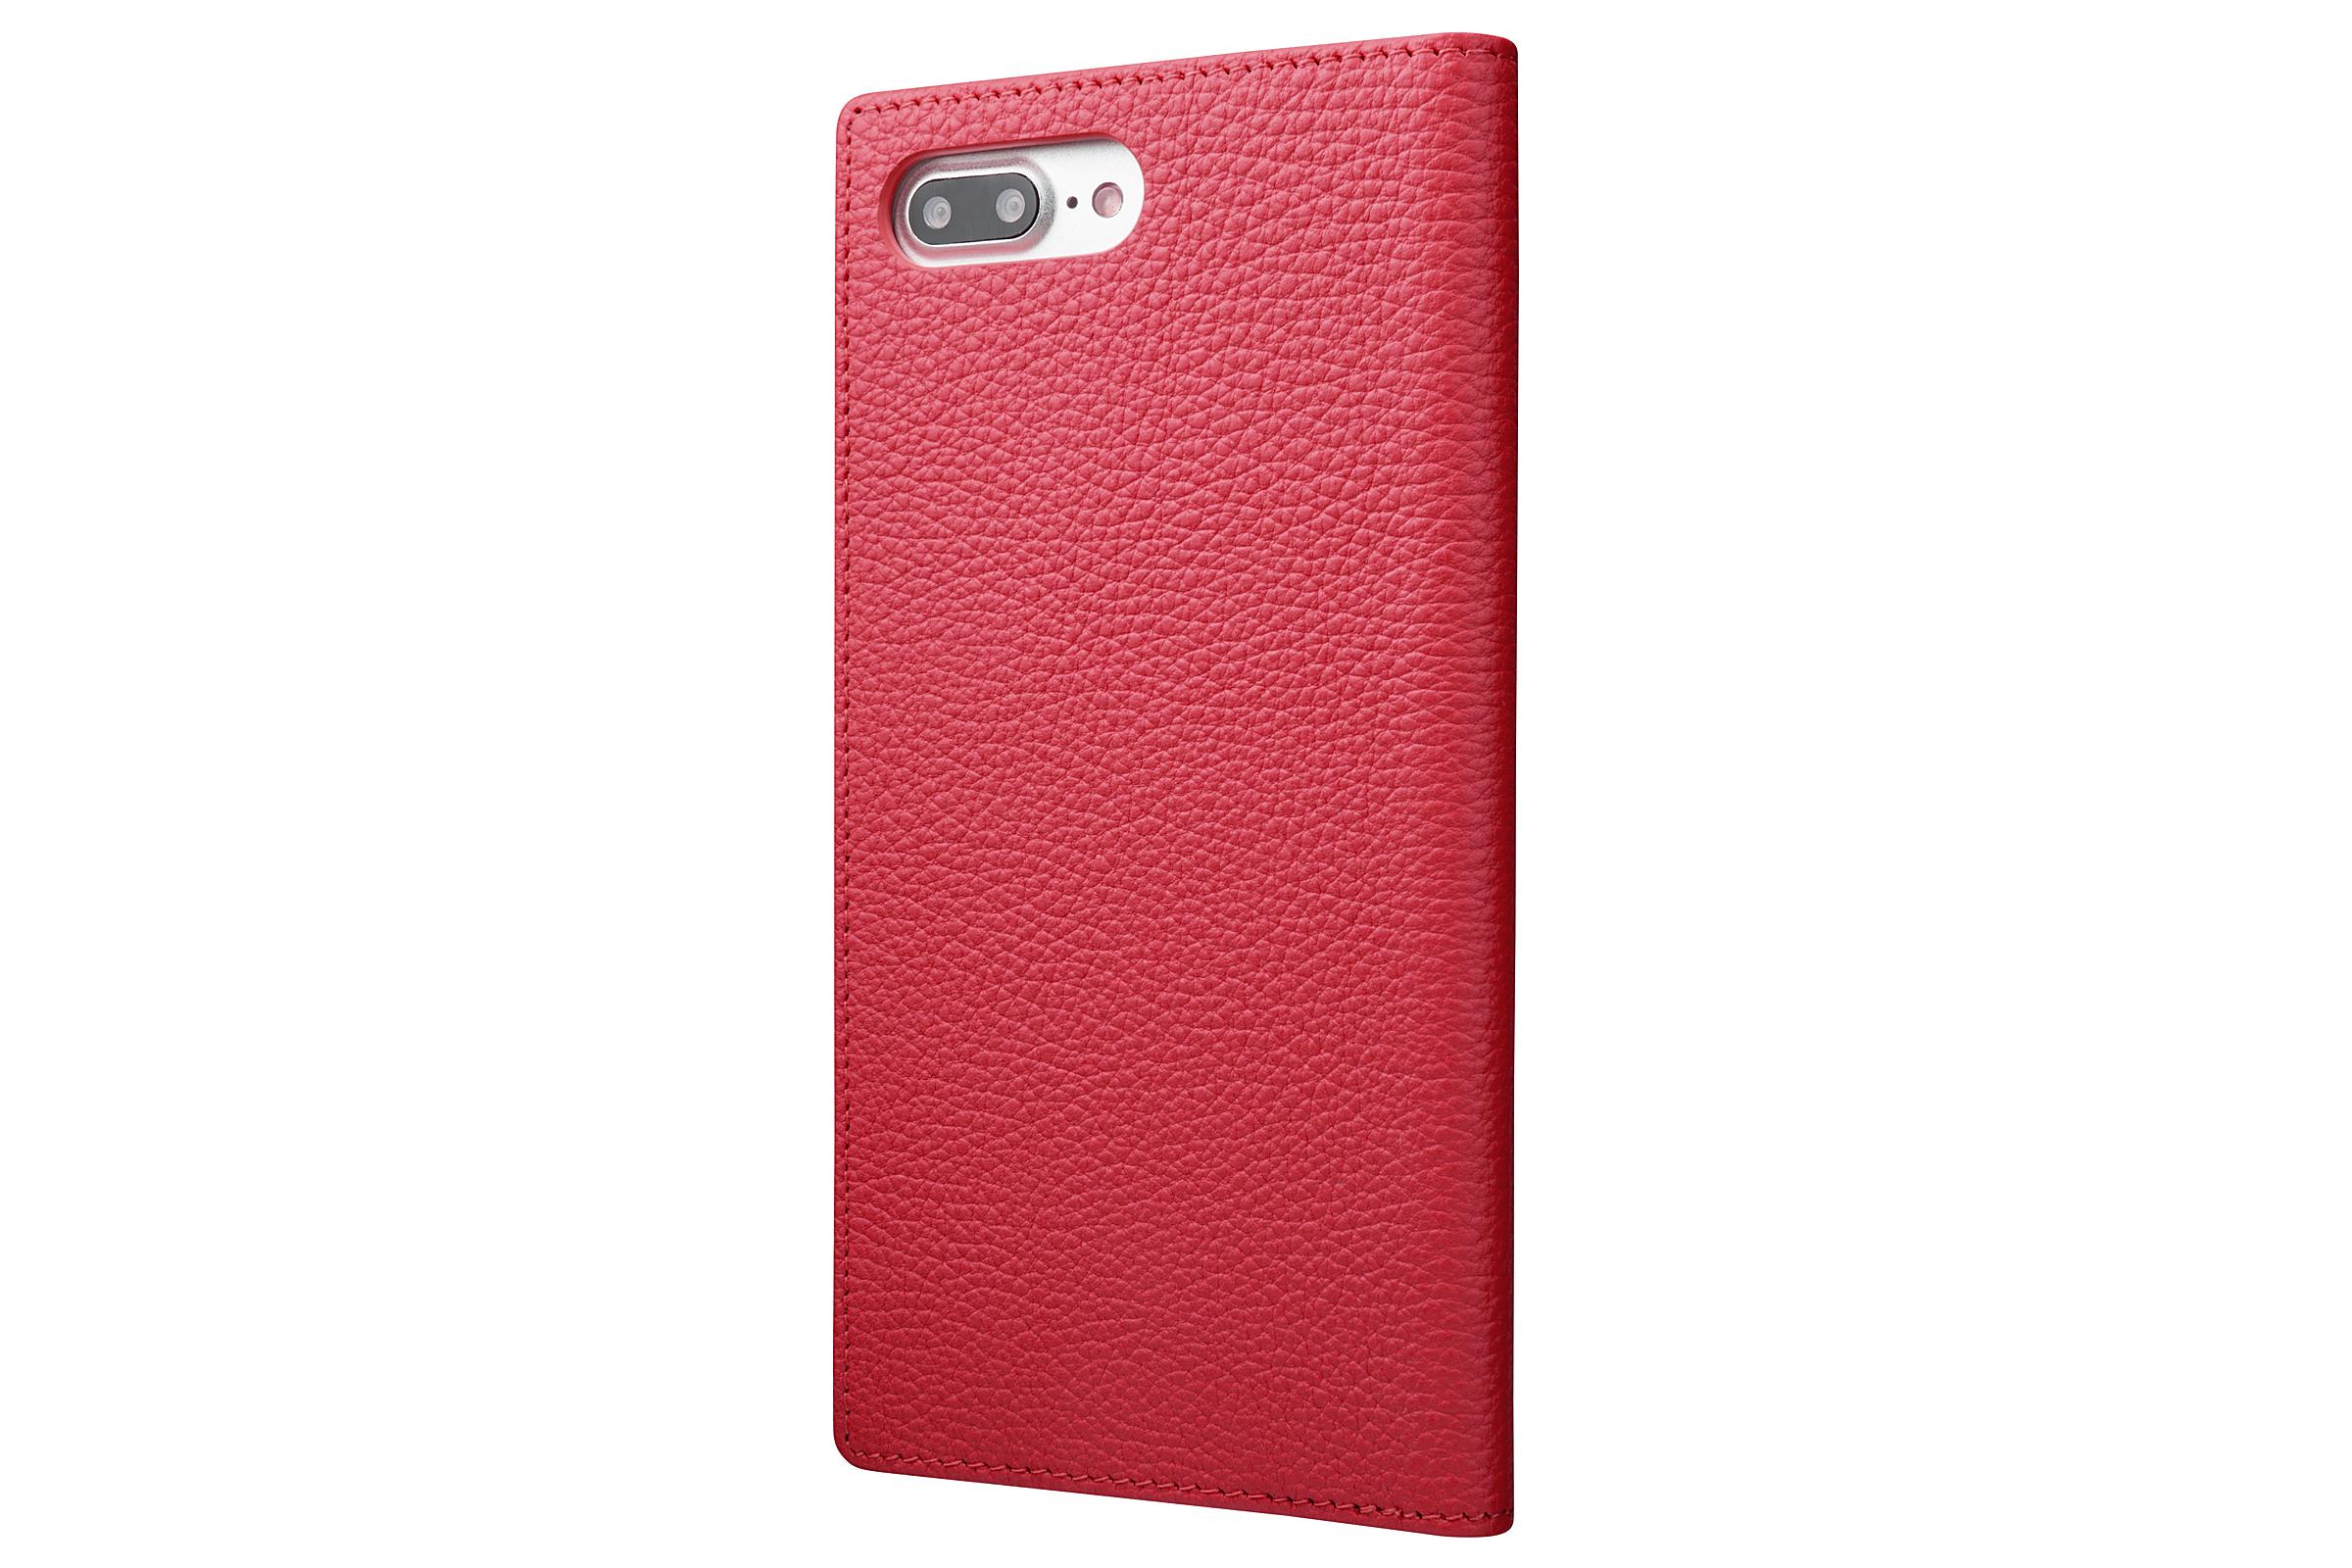 GRAMAS Shrunken-calf Full Leather Case for iPhone 7 Plus(Pink) シュランケンカーフ 手帳型フルレザーケース - 画像2